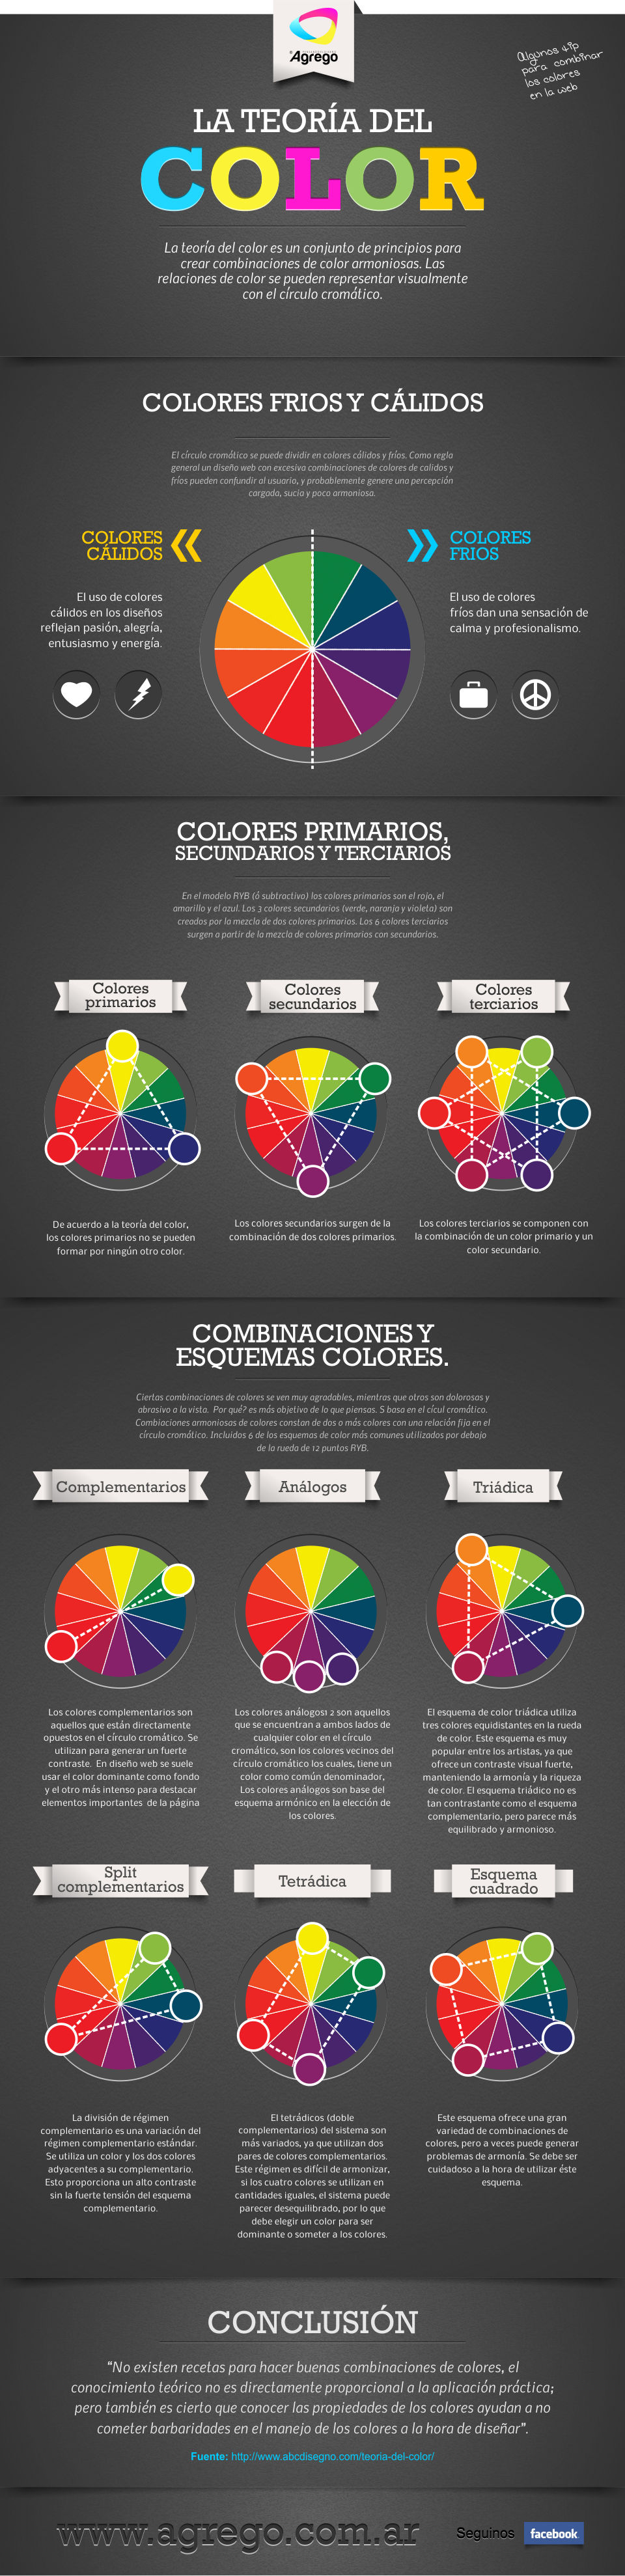 la teoria del color